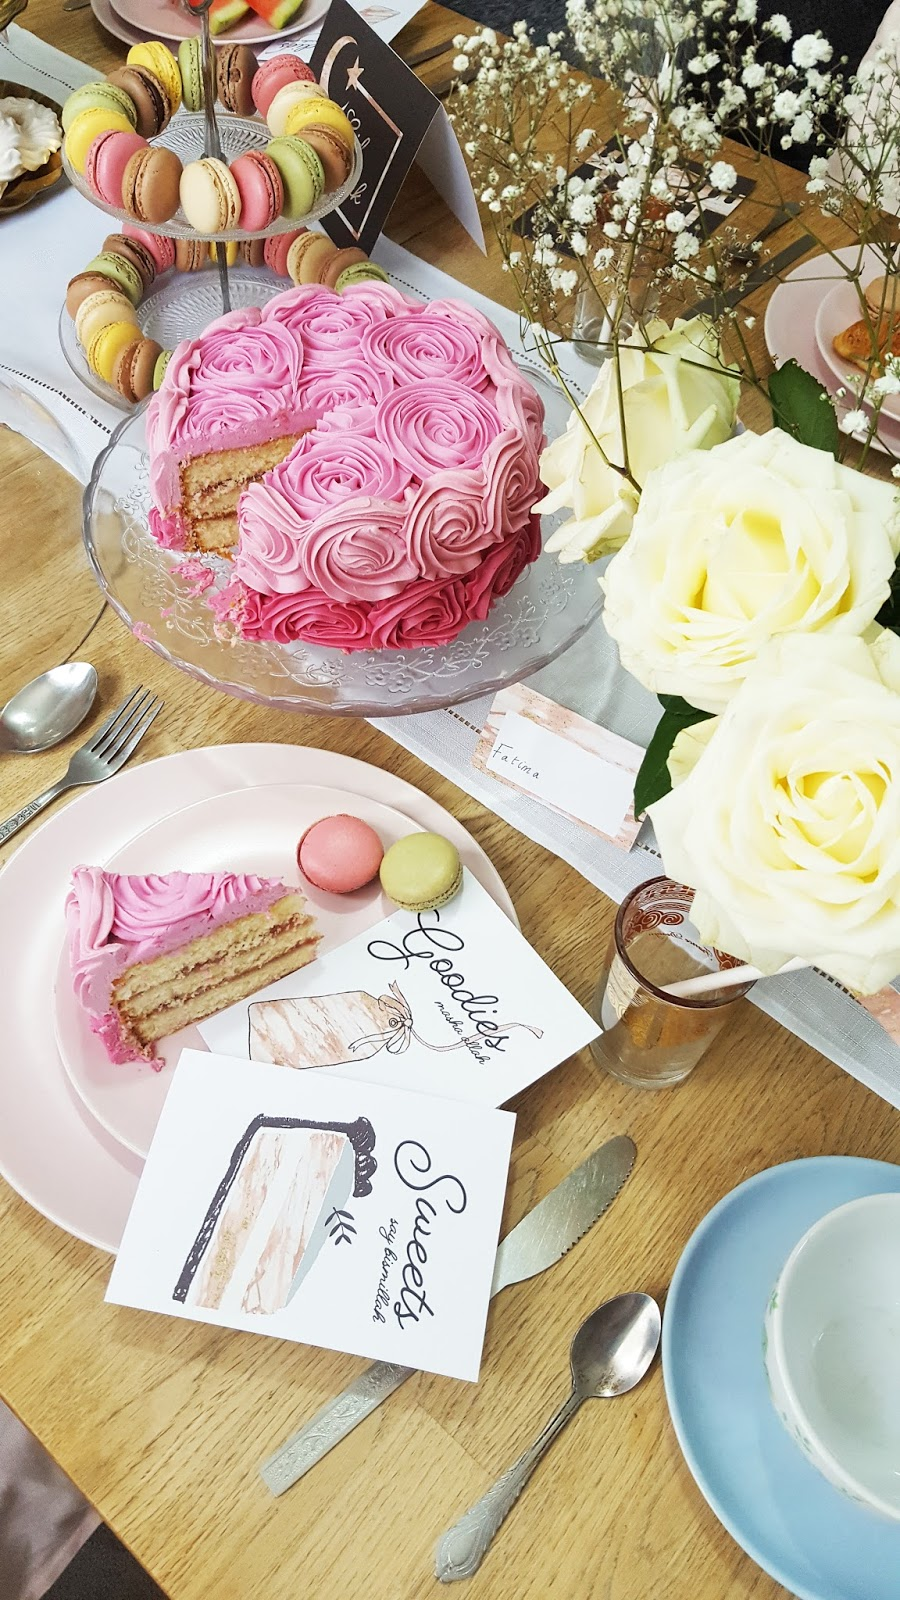 sainsburys roses cake